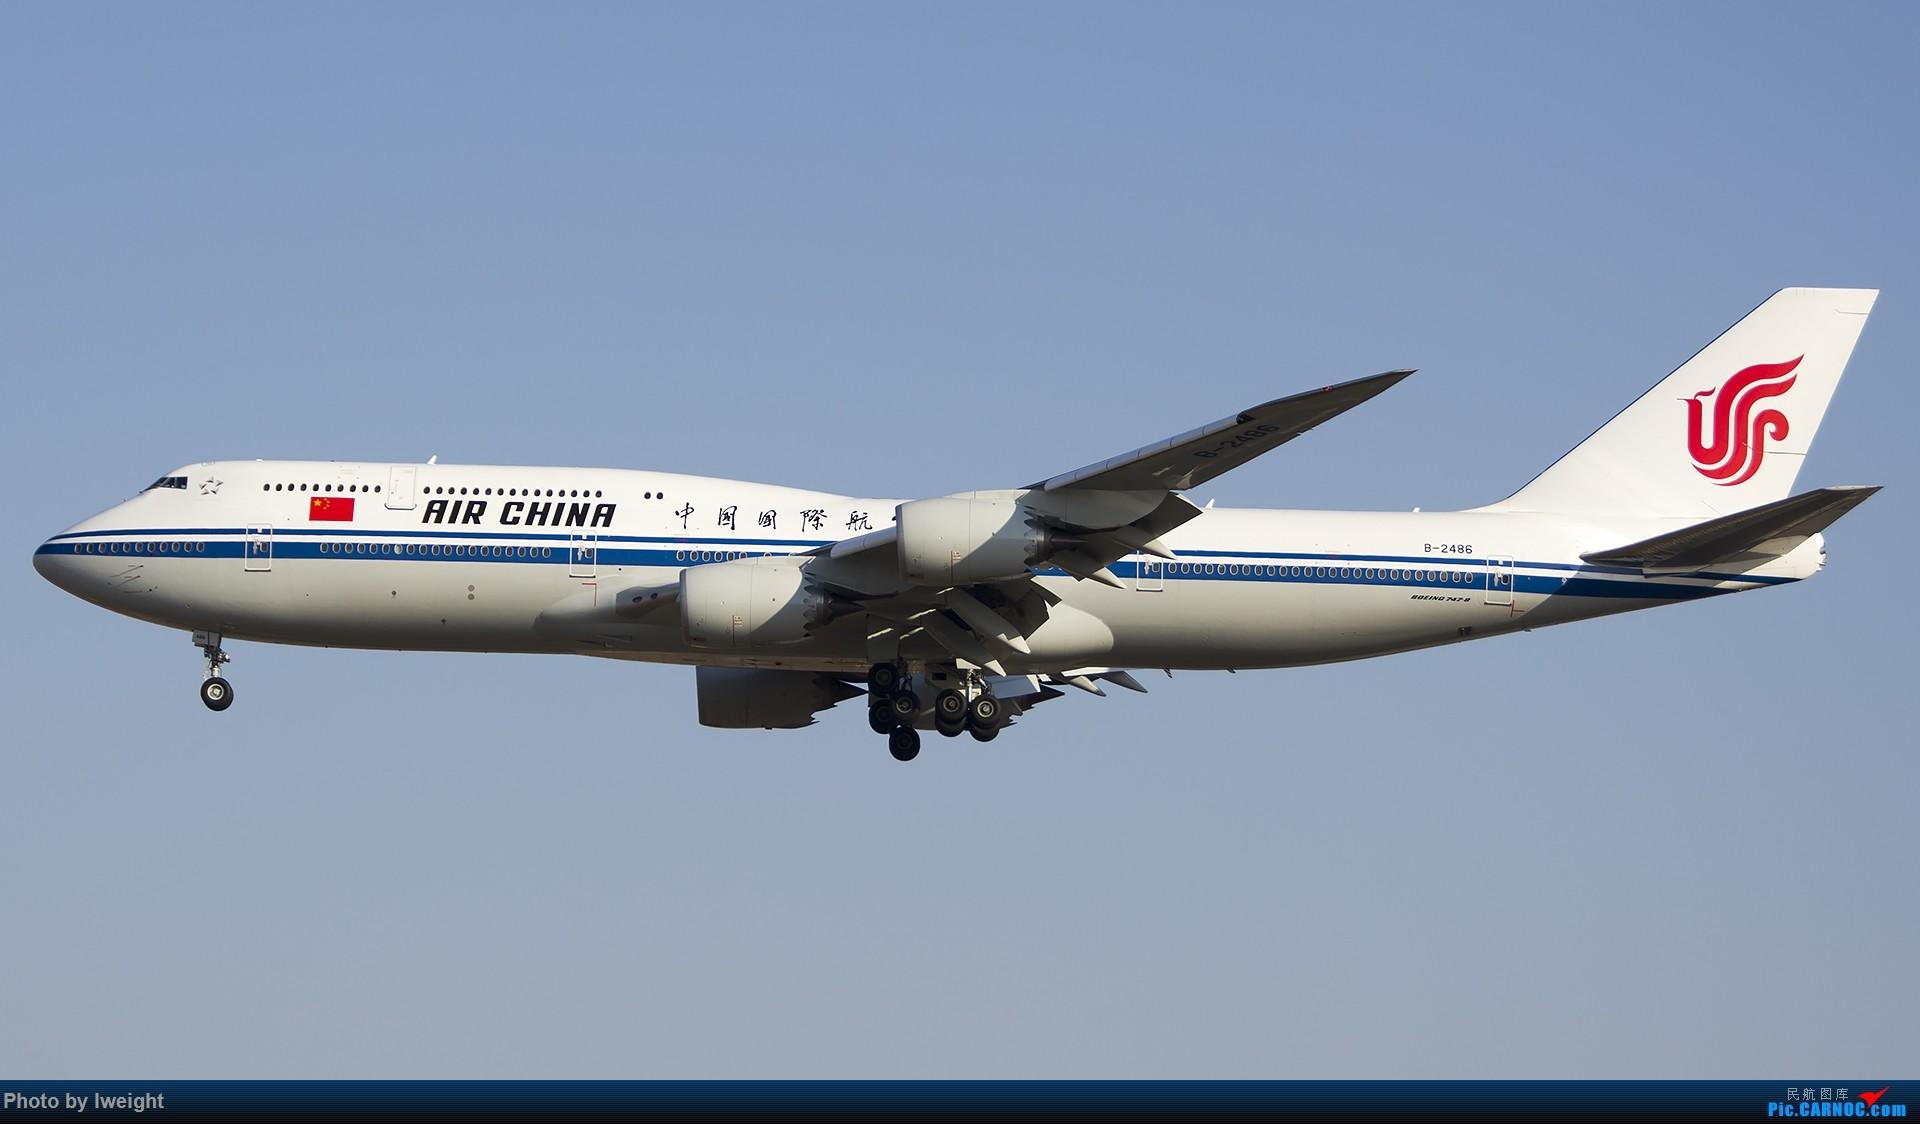 Re:[原创]庆祝升级777,发上今天在首都机场拍的所有飞机【2014-12-14】 BOEING 747-8I B-2486 中国北京首都国际机场